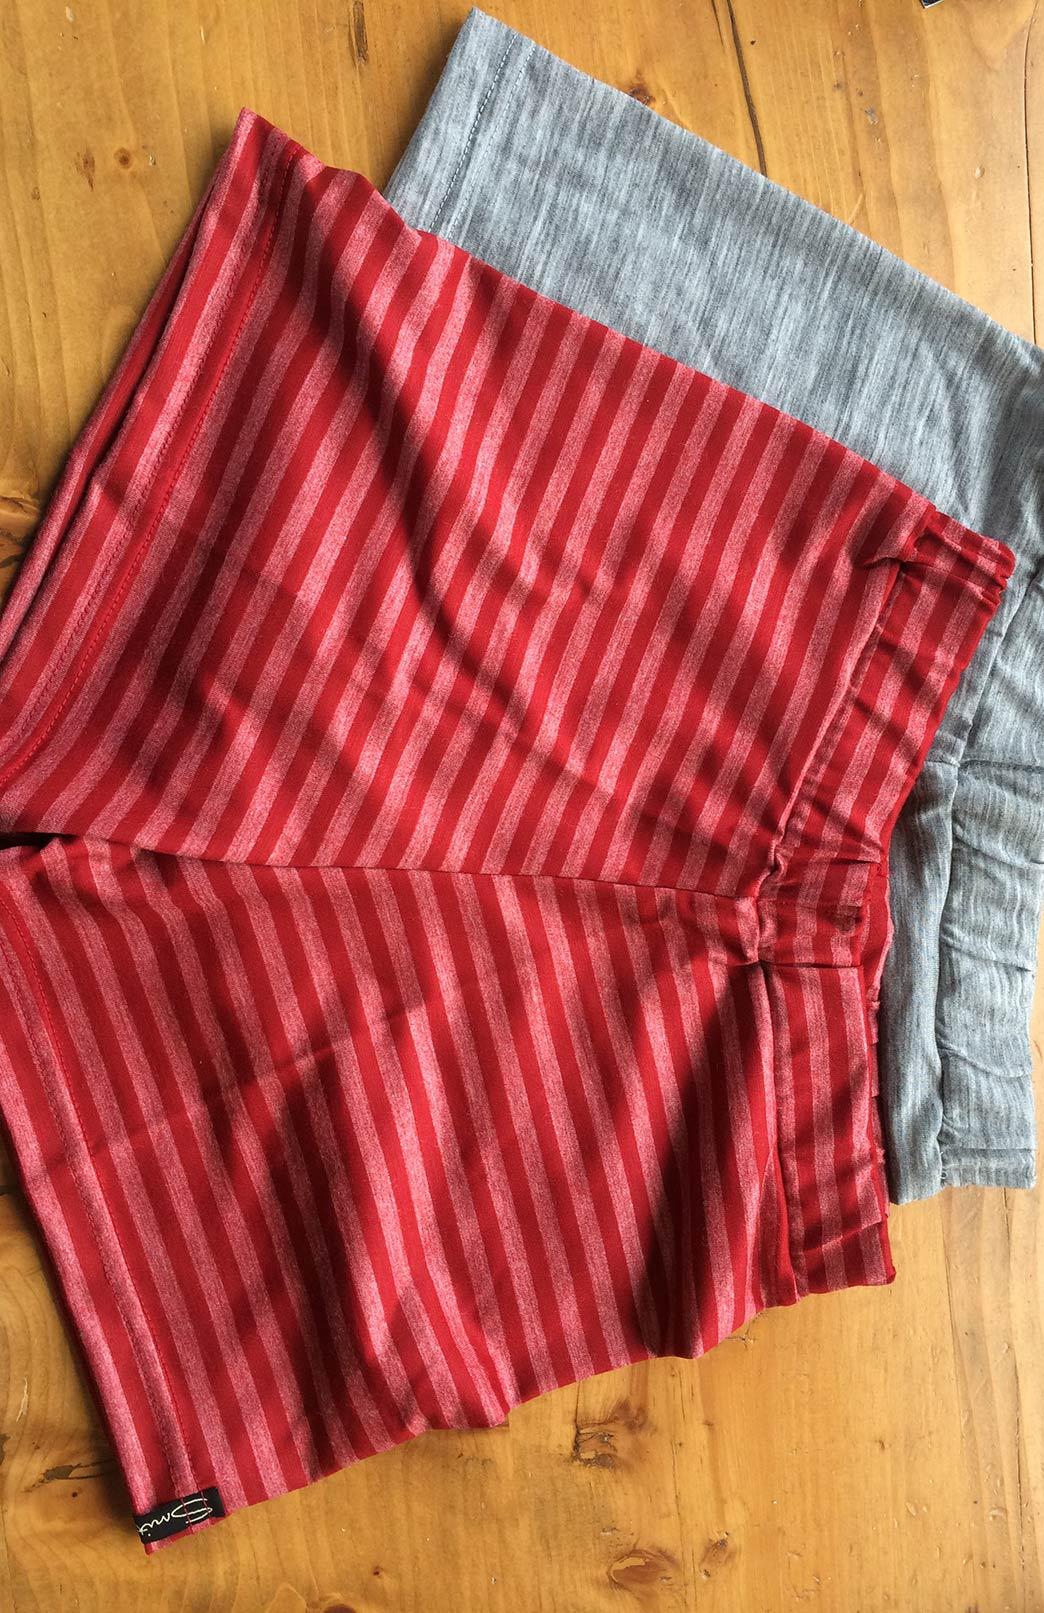 Men's Boxer Shorts - Merino Wool Modal Blend Comfort Fit Boxer Shorts - Smitten Merino Tasmania Australia